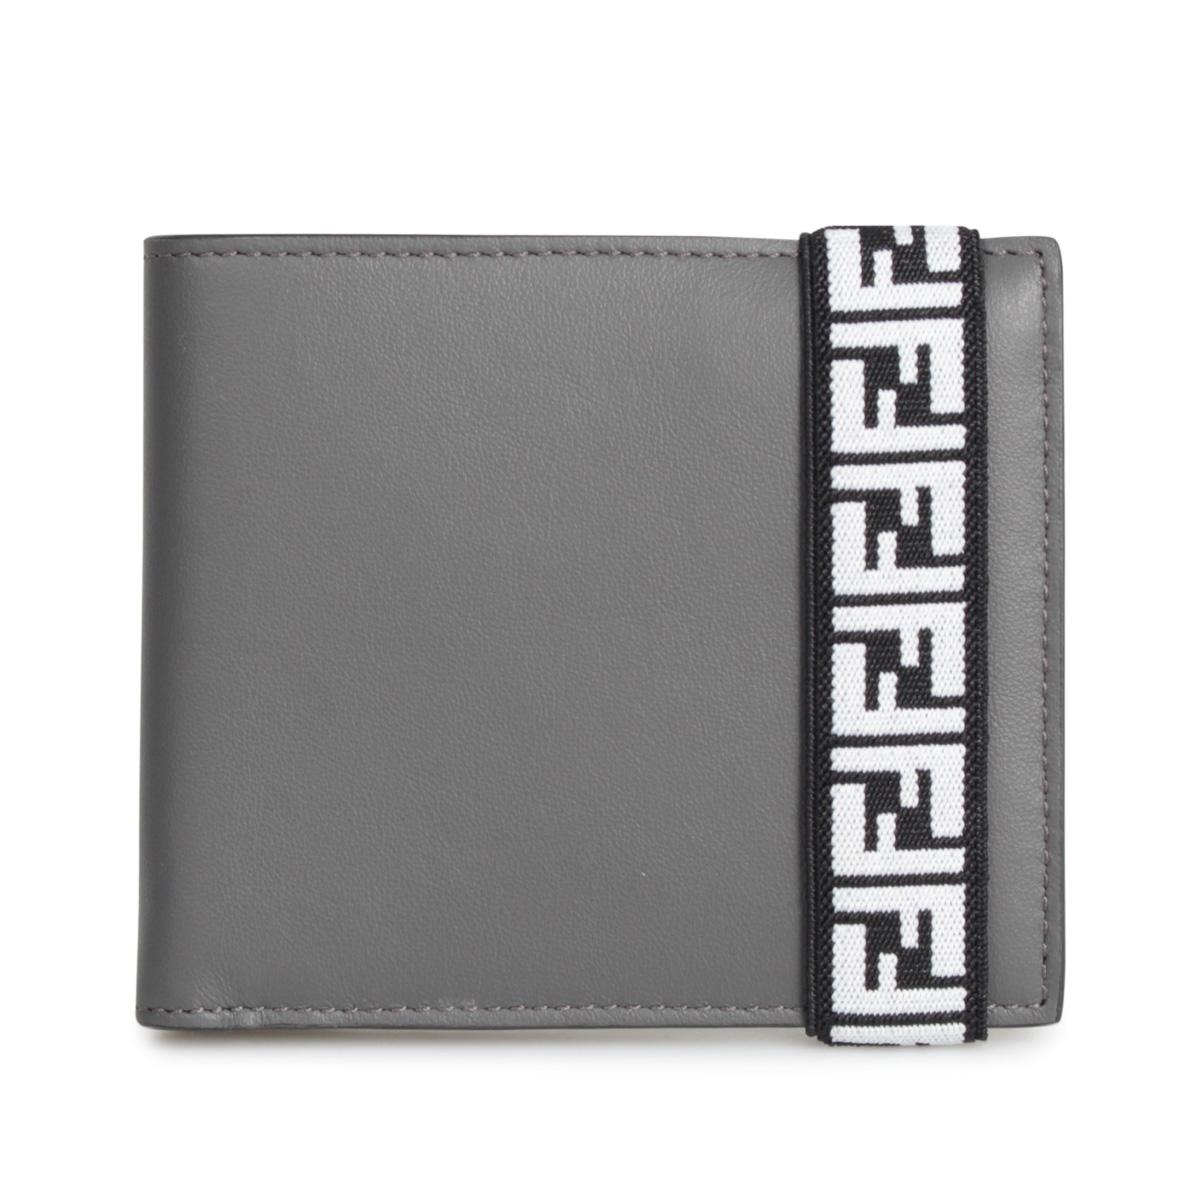 FENDI BI-FOLD WALLET フェンディ 財布 二つ折り メンズ グレー SFD0132 [12/5 新入荷]